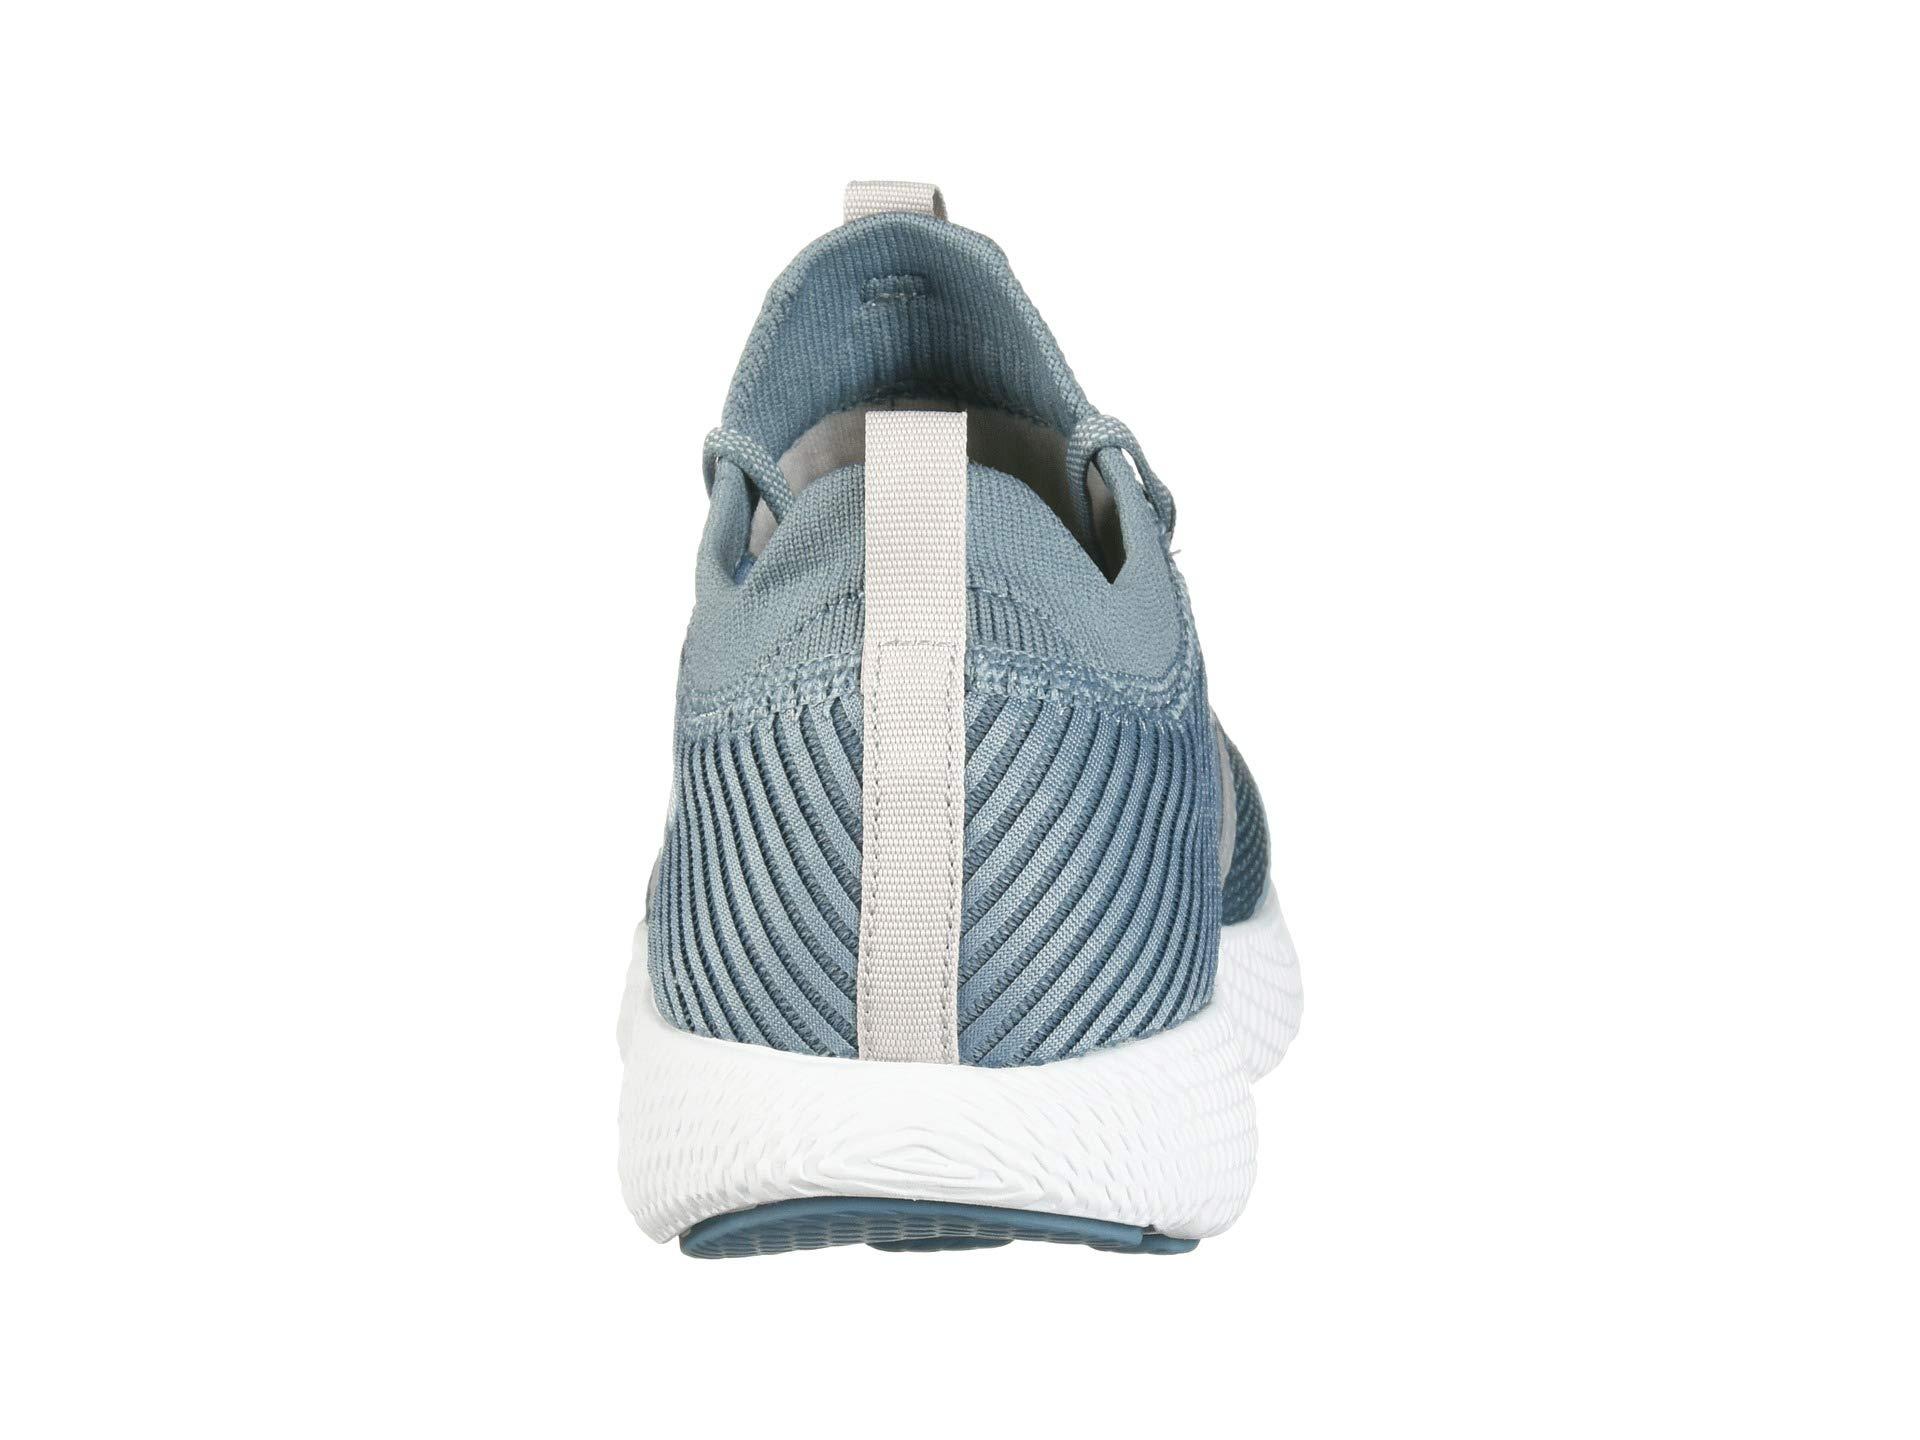 Horizon Shoes Blue En Sneakersamp; Skechers Redwxocb Athletic Light PTXZlwOkiu